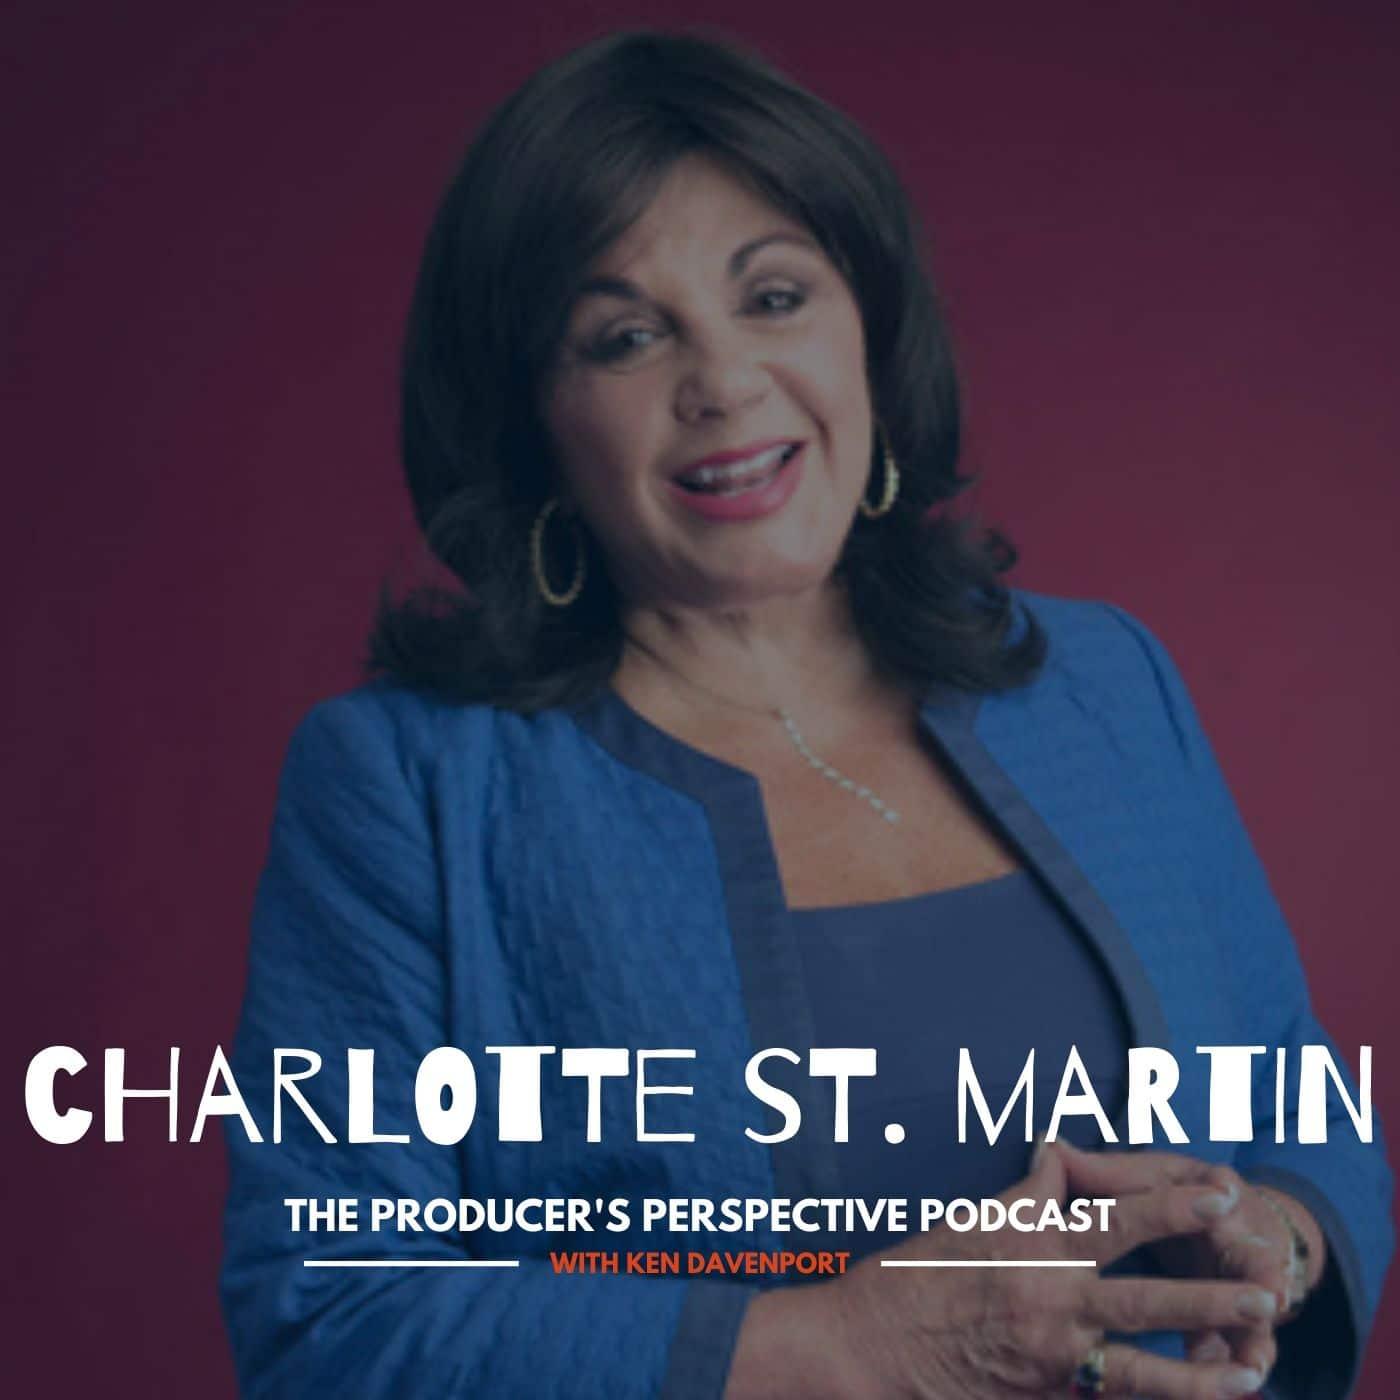 Ken Davenport's The Producer's Perspective Podcast Episode 2 - Charlotte St. Martin